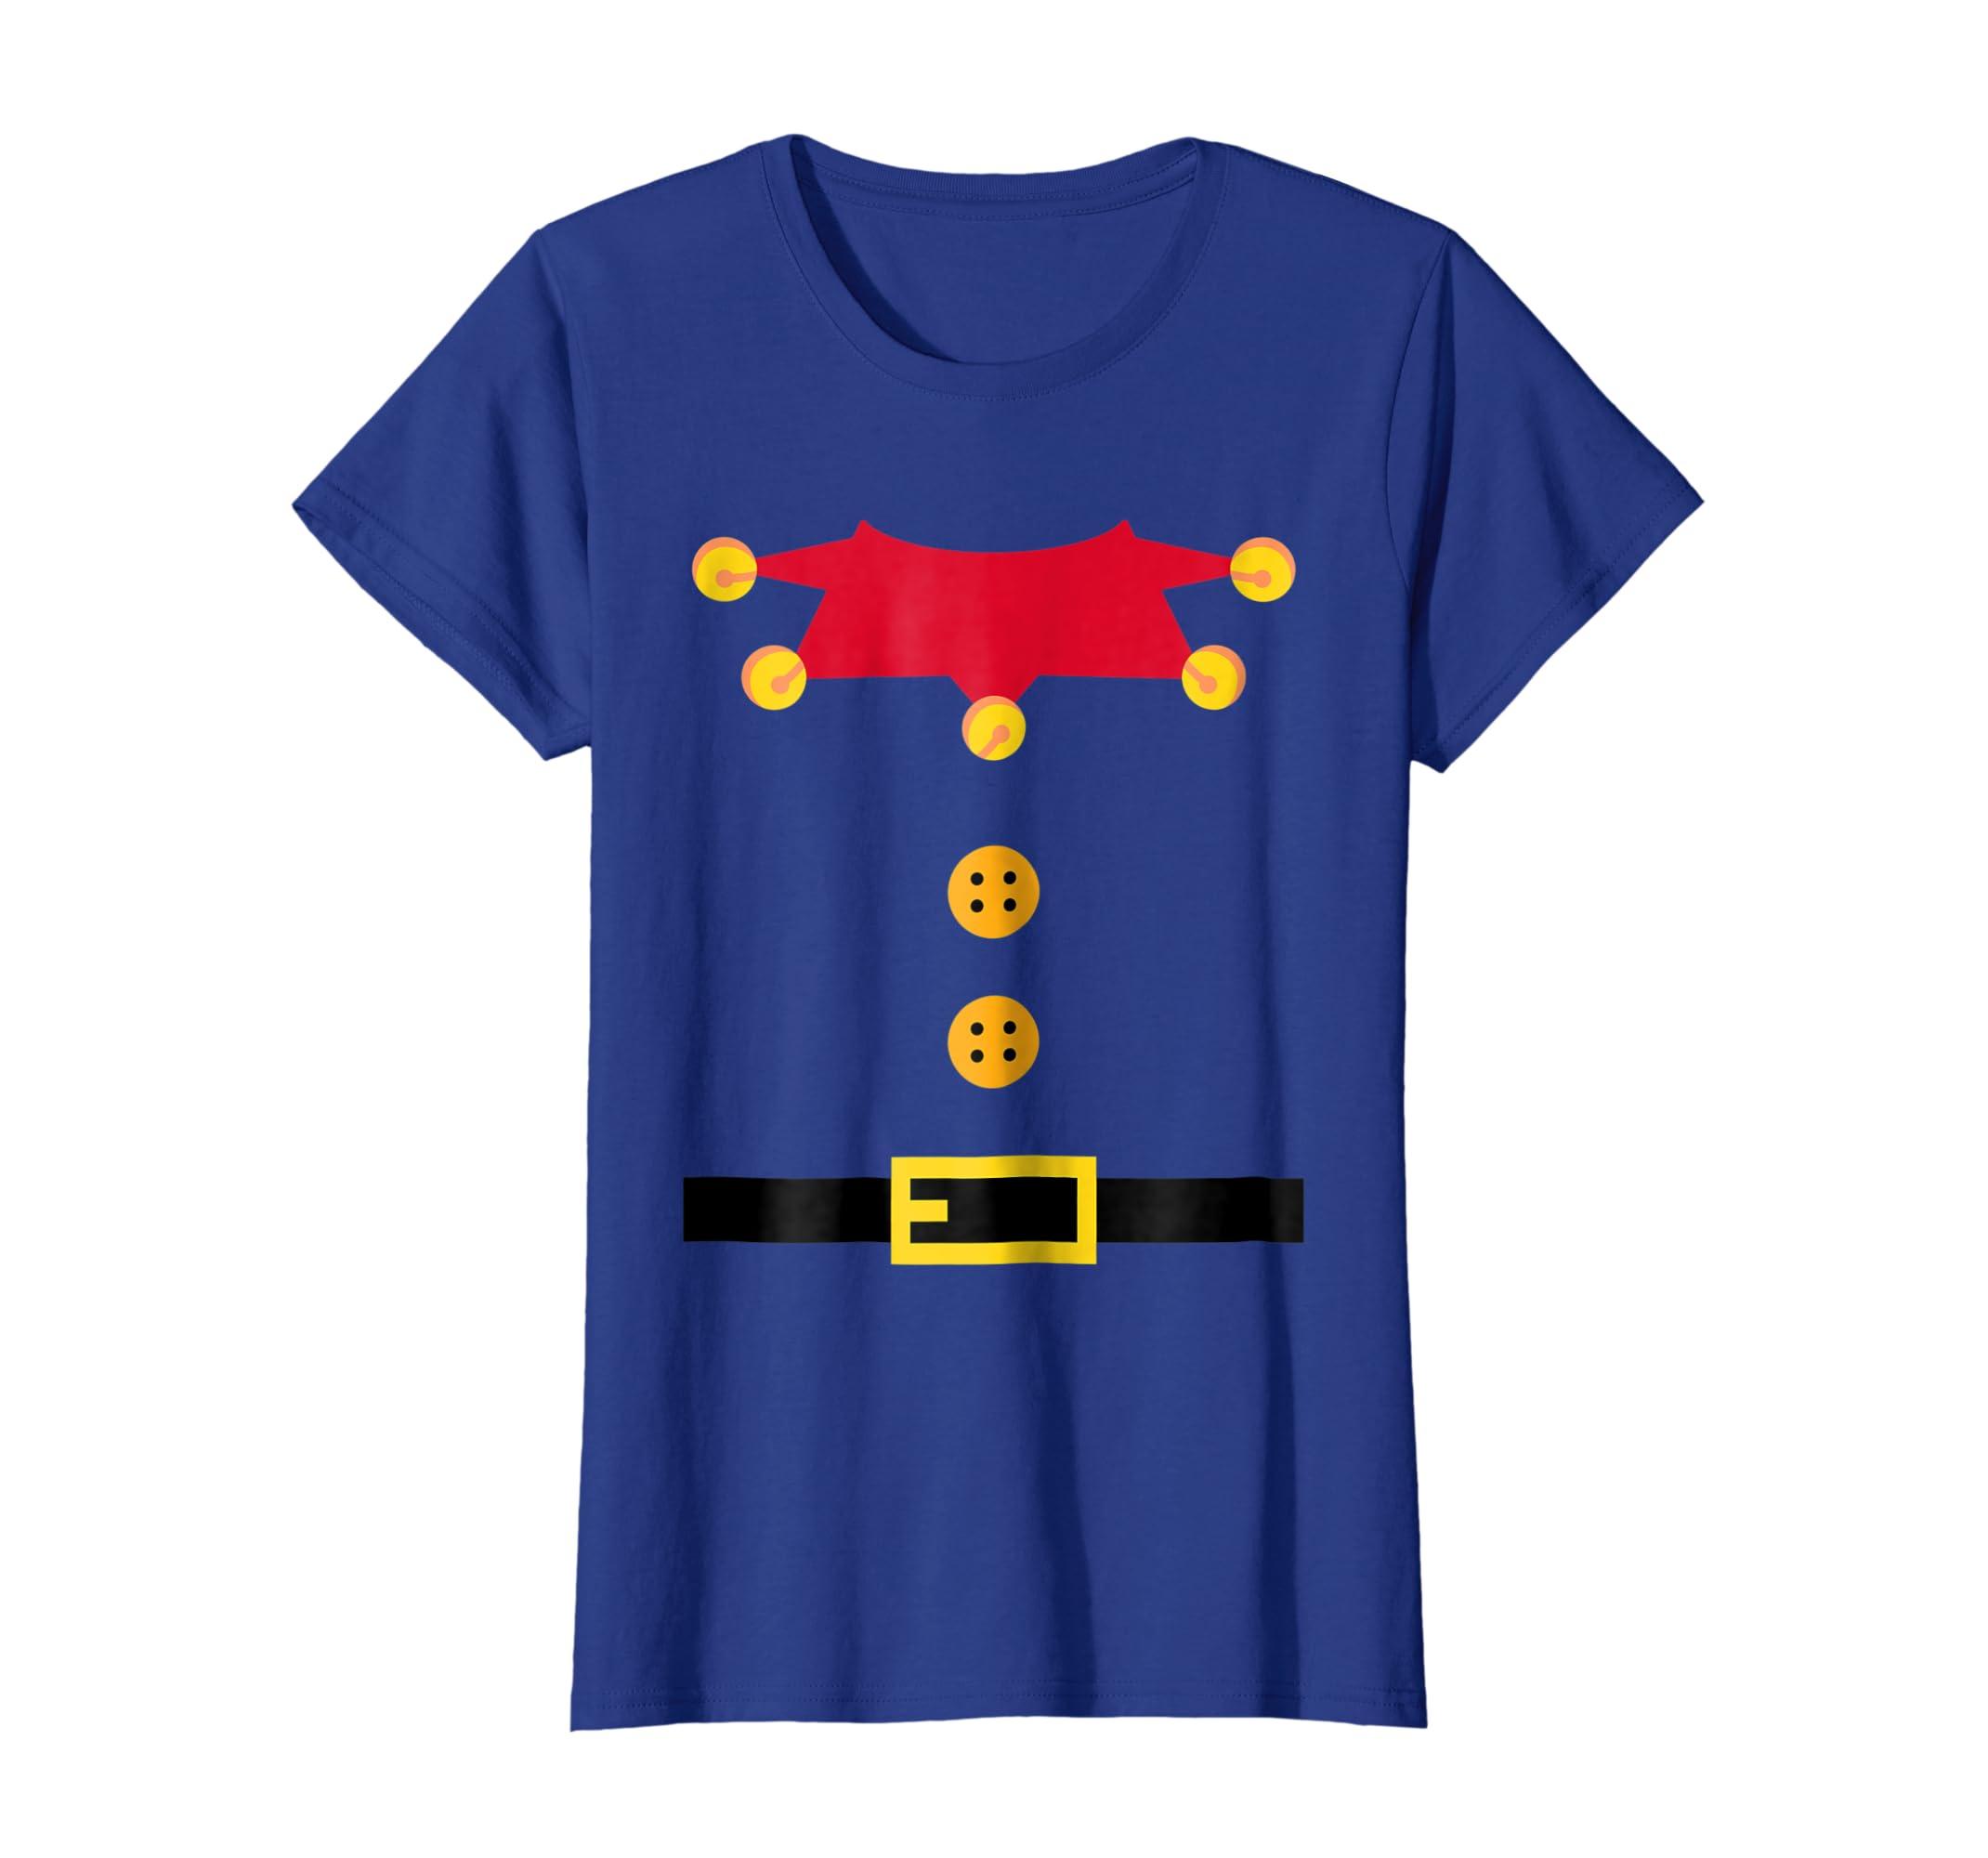 d481e3dc26 Amazon.com  Funny Elf Christmas Pajamas Tee Kids Mom Dad Matching Shirt   Clothing